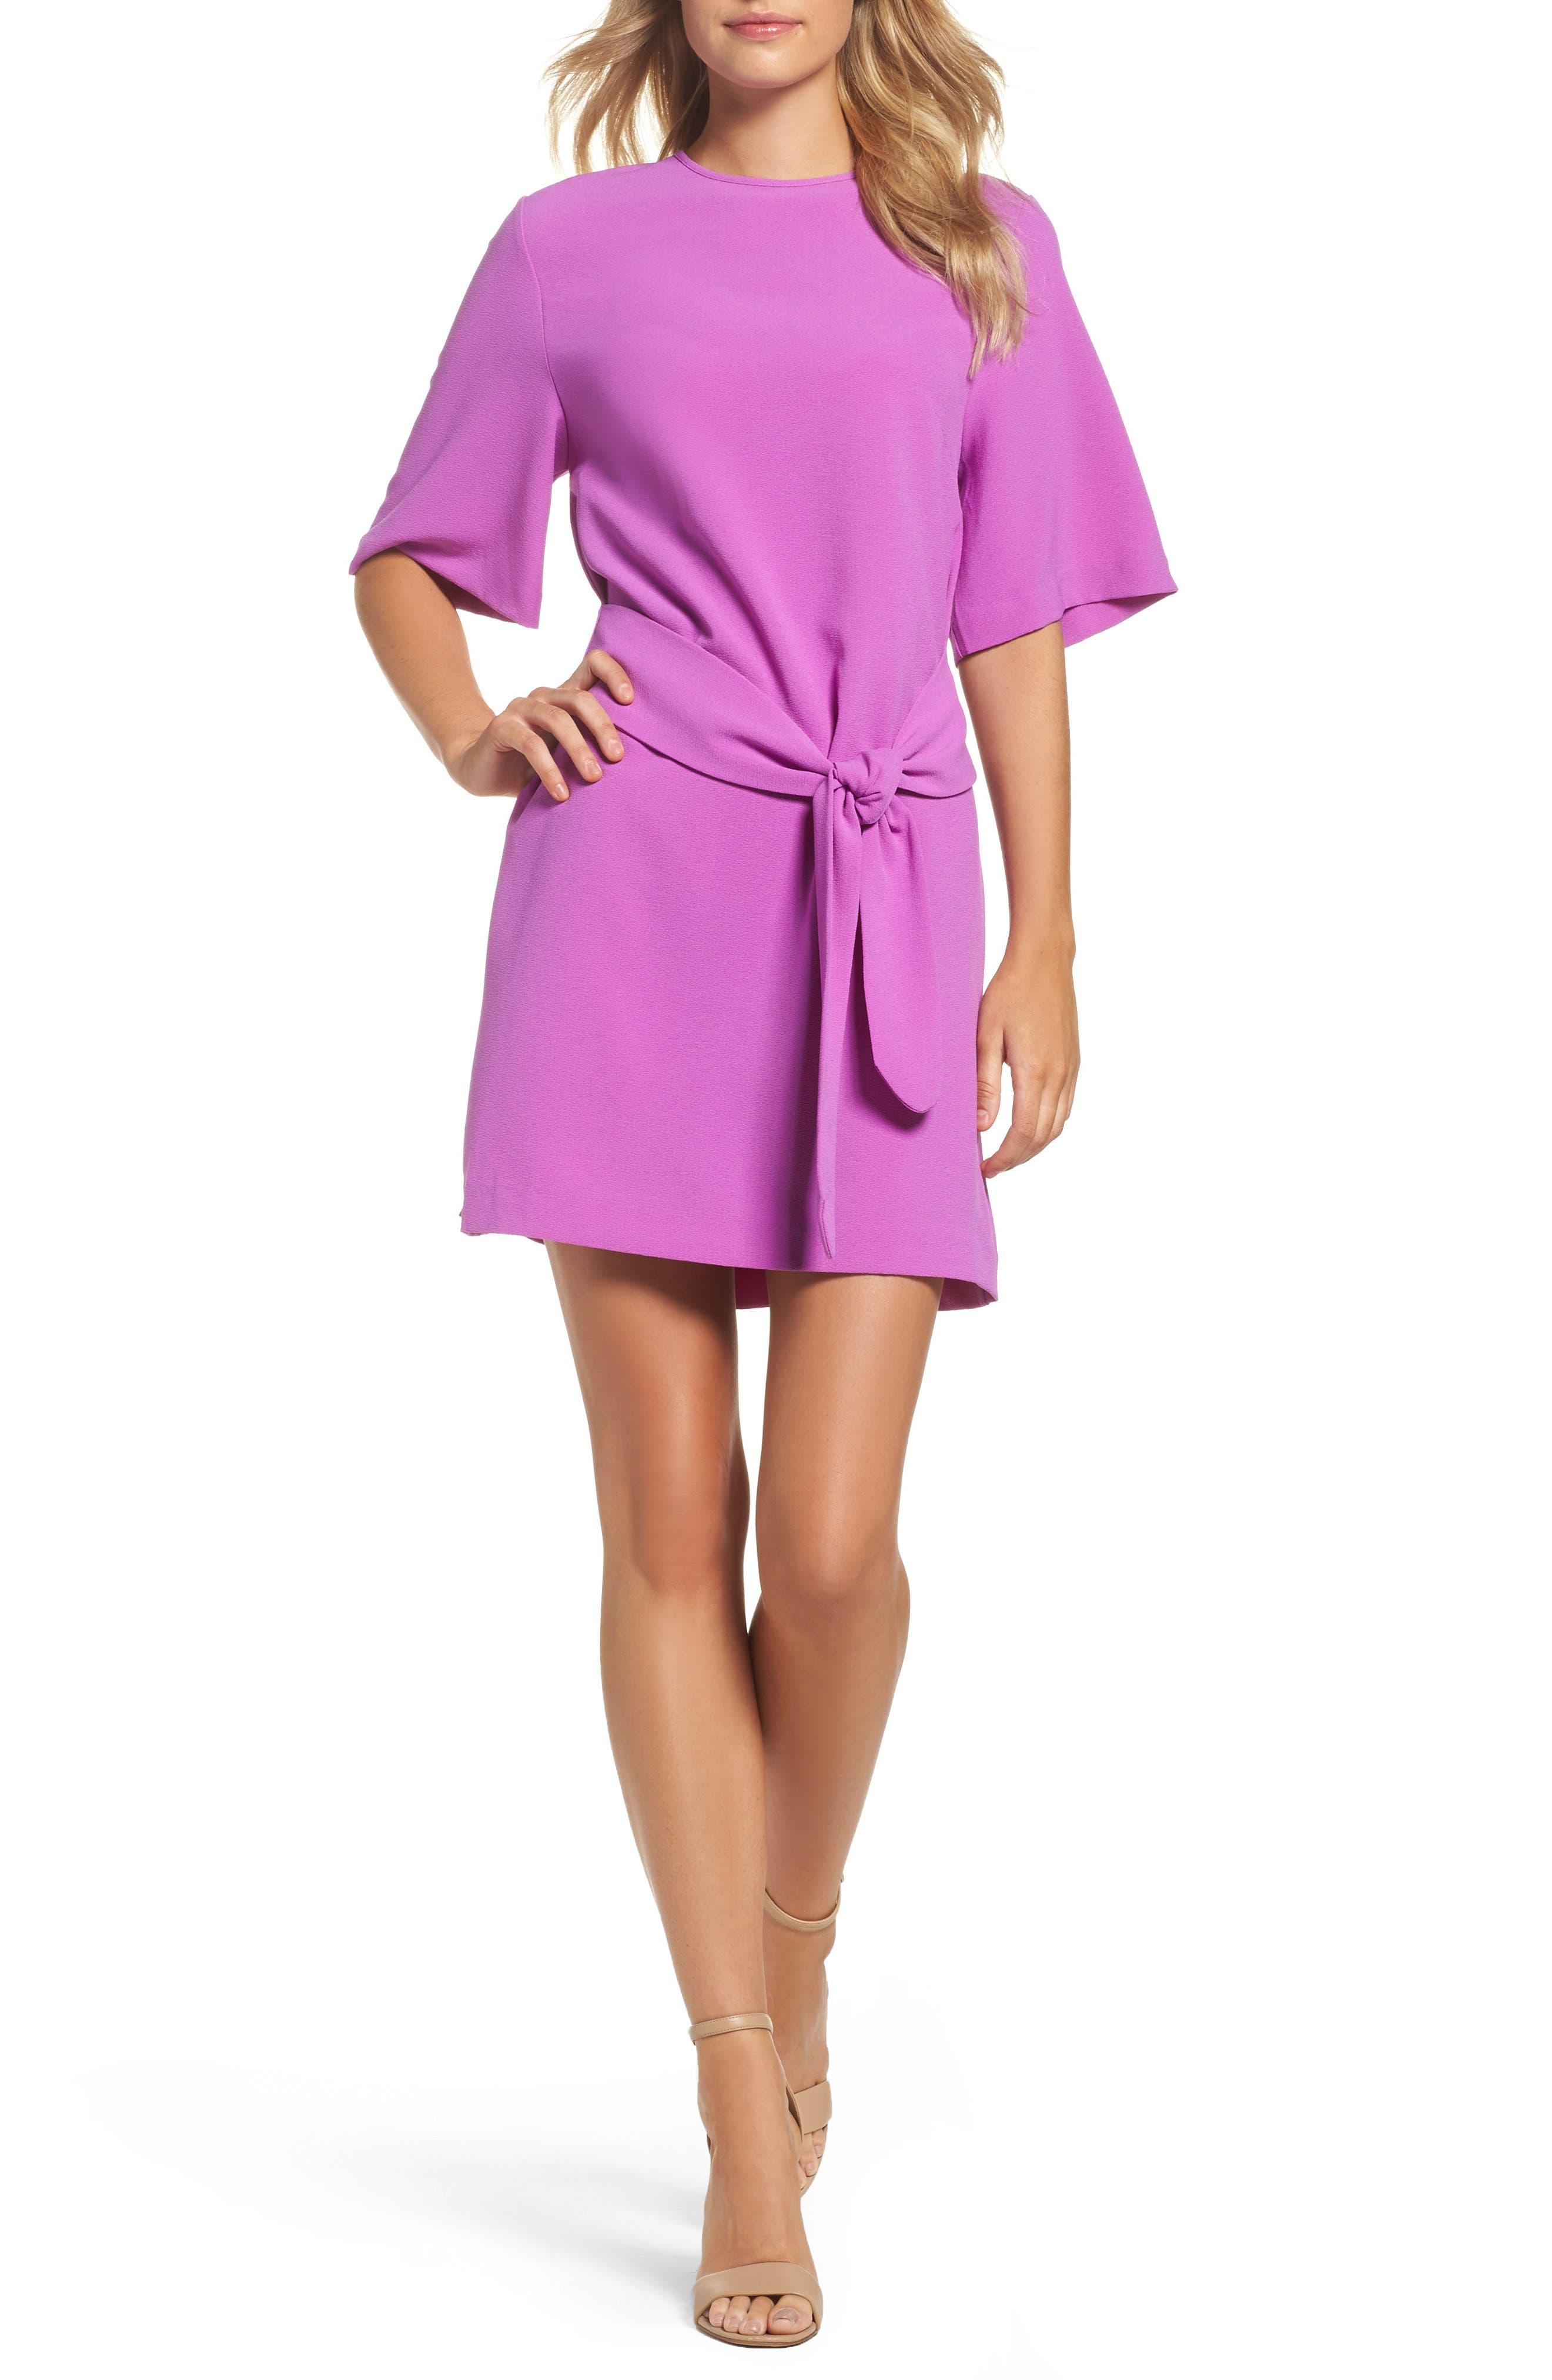 Felicity & Coco Shift Dress (Nordstrom Exclusive)